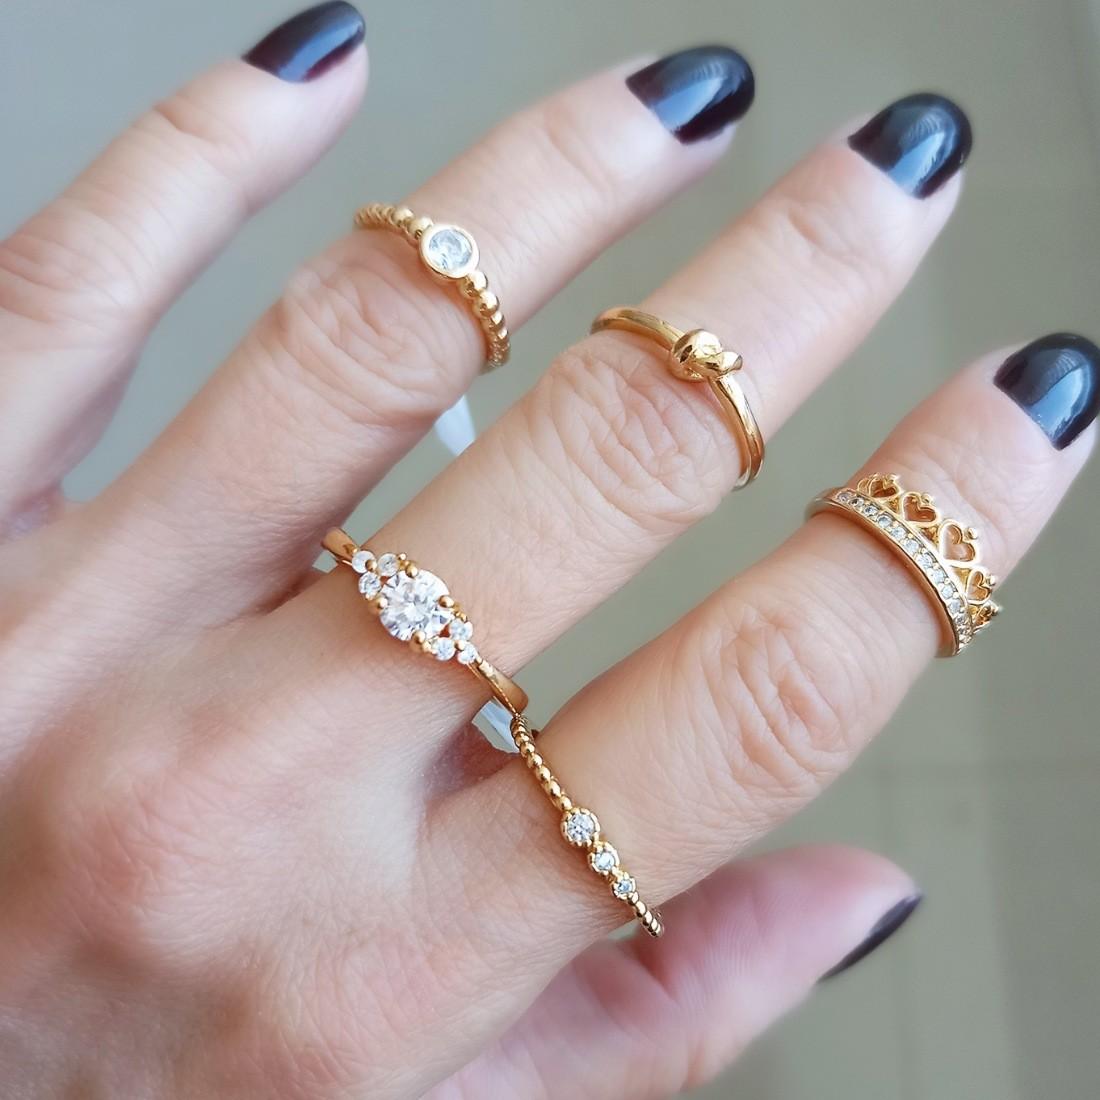 Anel Falange Coroa de Micro Zircônia Branca Brilhante Semijoia em Ouro 18K  - Soloyou